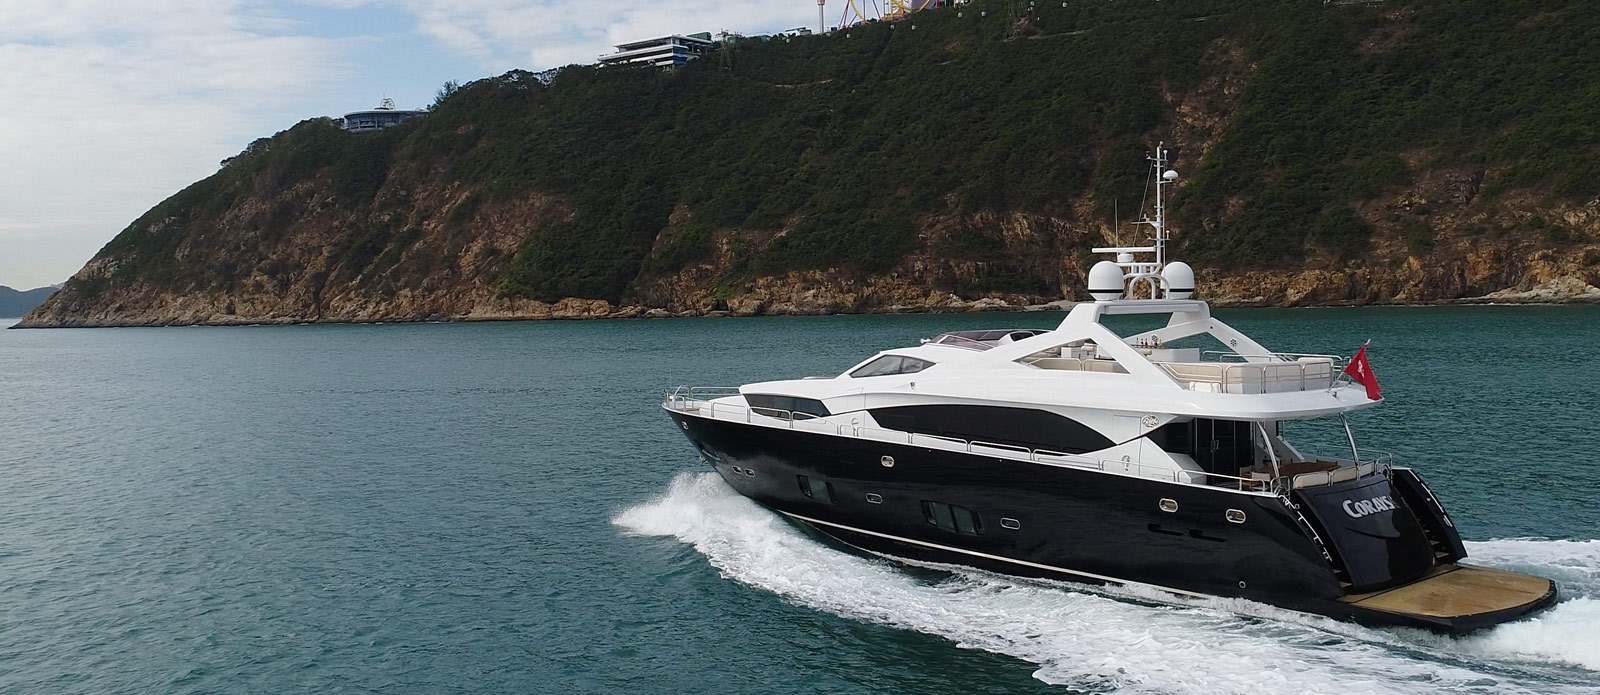 Sunseeker-30-Metre-Yacht-Coraysa-Stern-View-Running-Shot